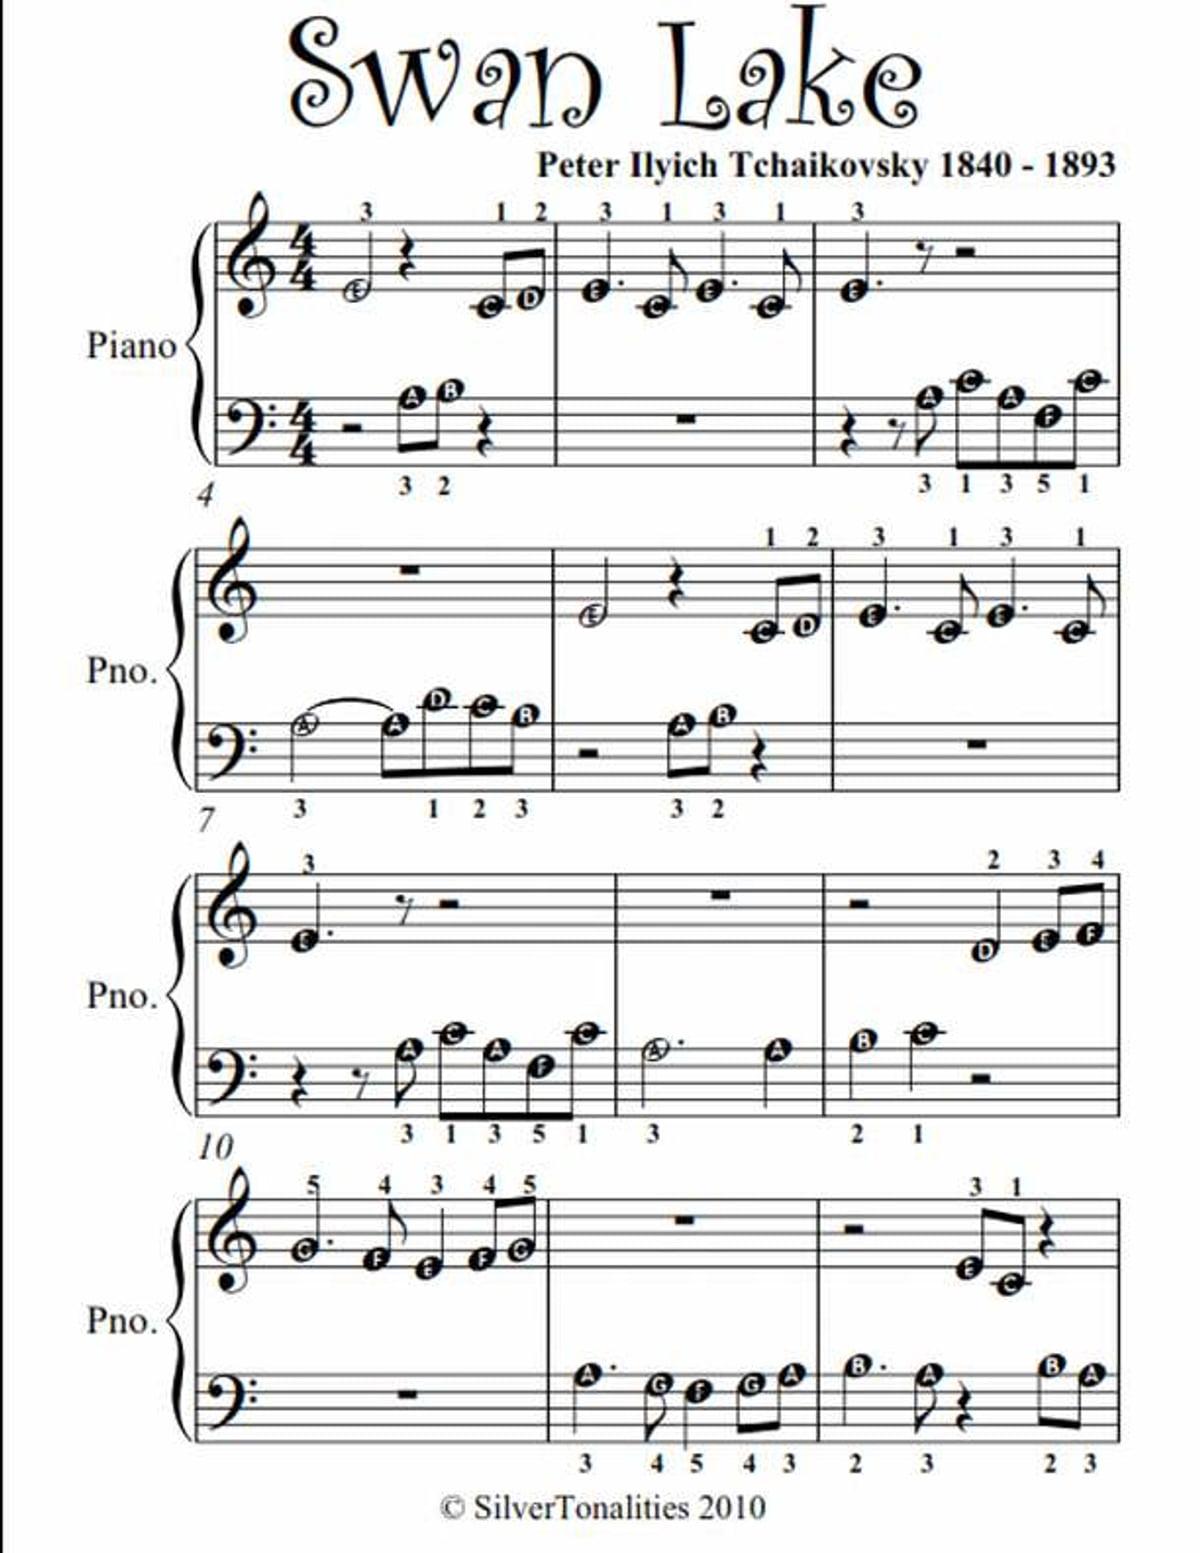 Swan Lake Beginner Piano Sheet Music Ebook By Peter Ilyich Tchaikovsky